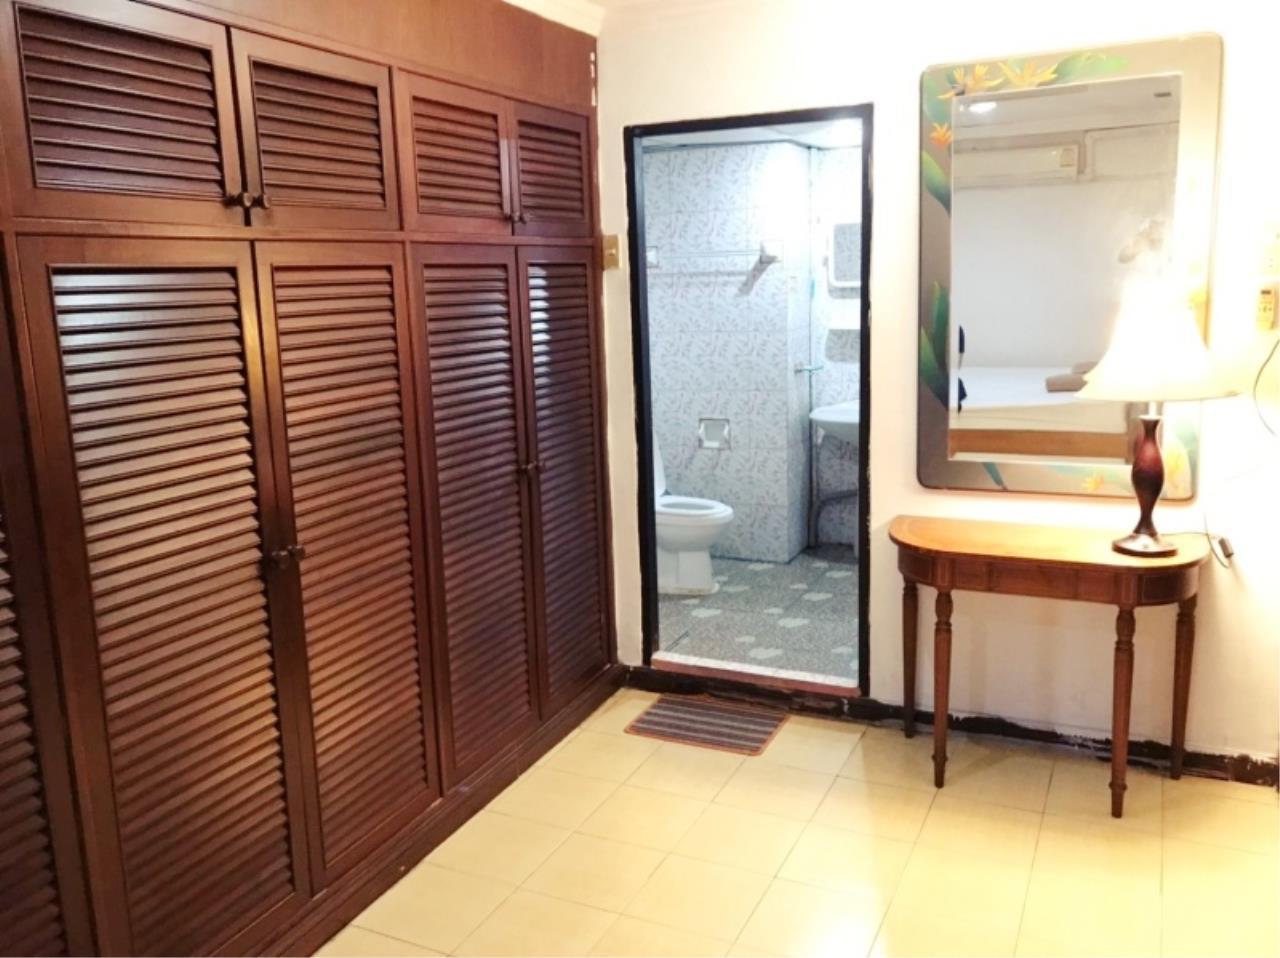 Century21 Skylux Agency's Ruenrudee Condominium / Condo For Sale / 1 Bedroom / 44 SQM / BTS Phloen Chit / Bangkok 4